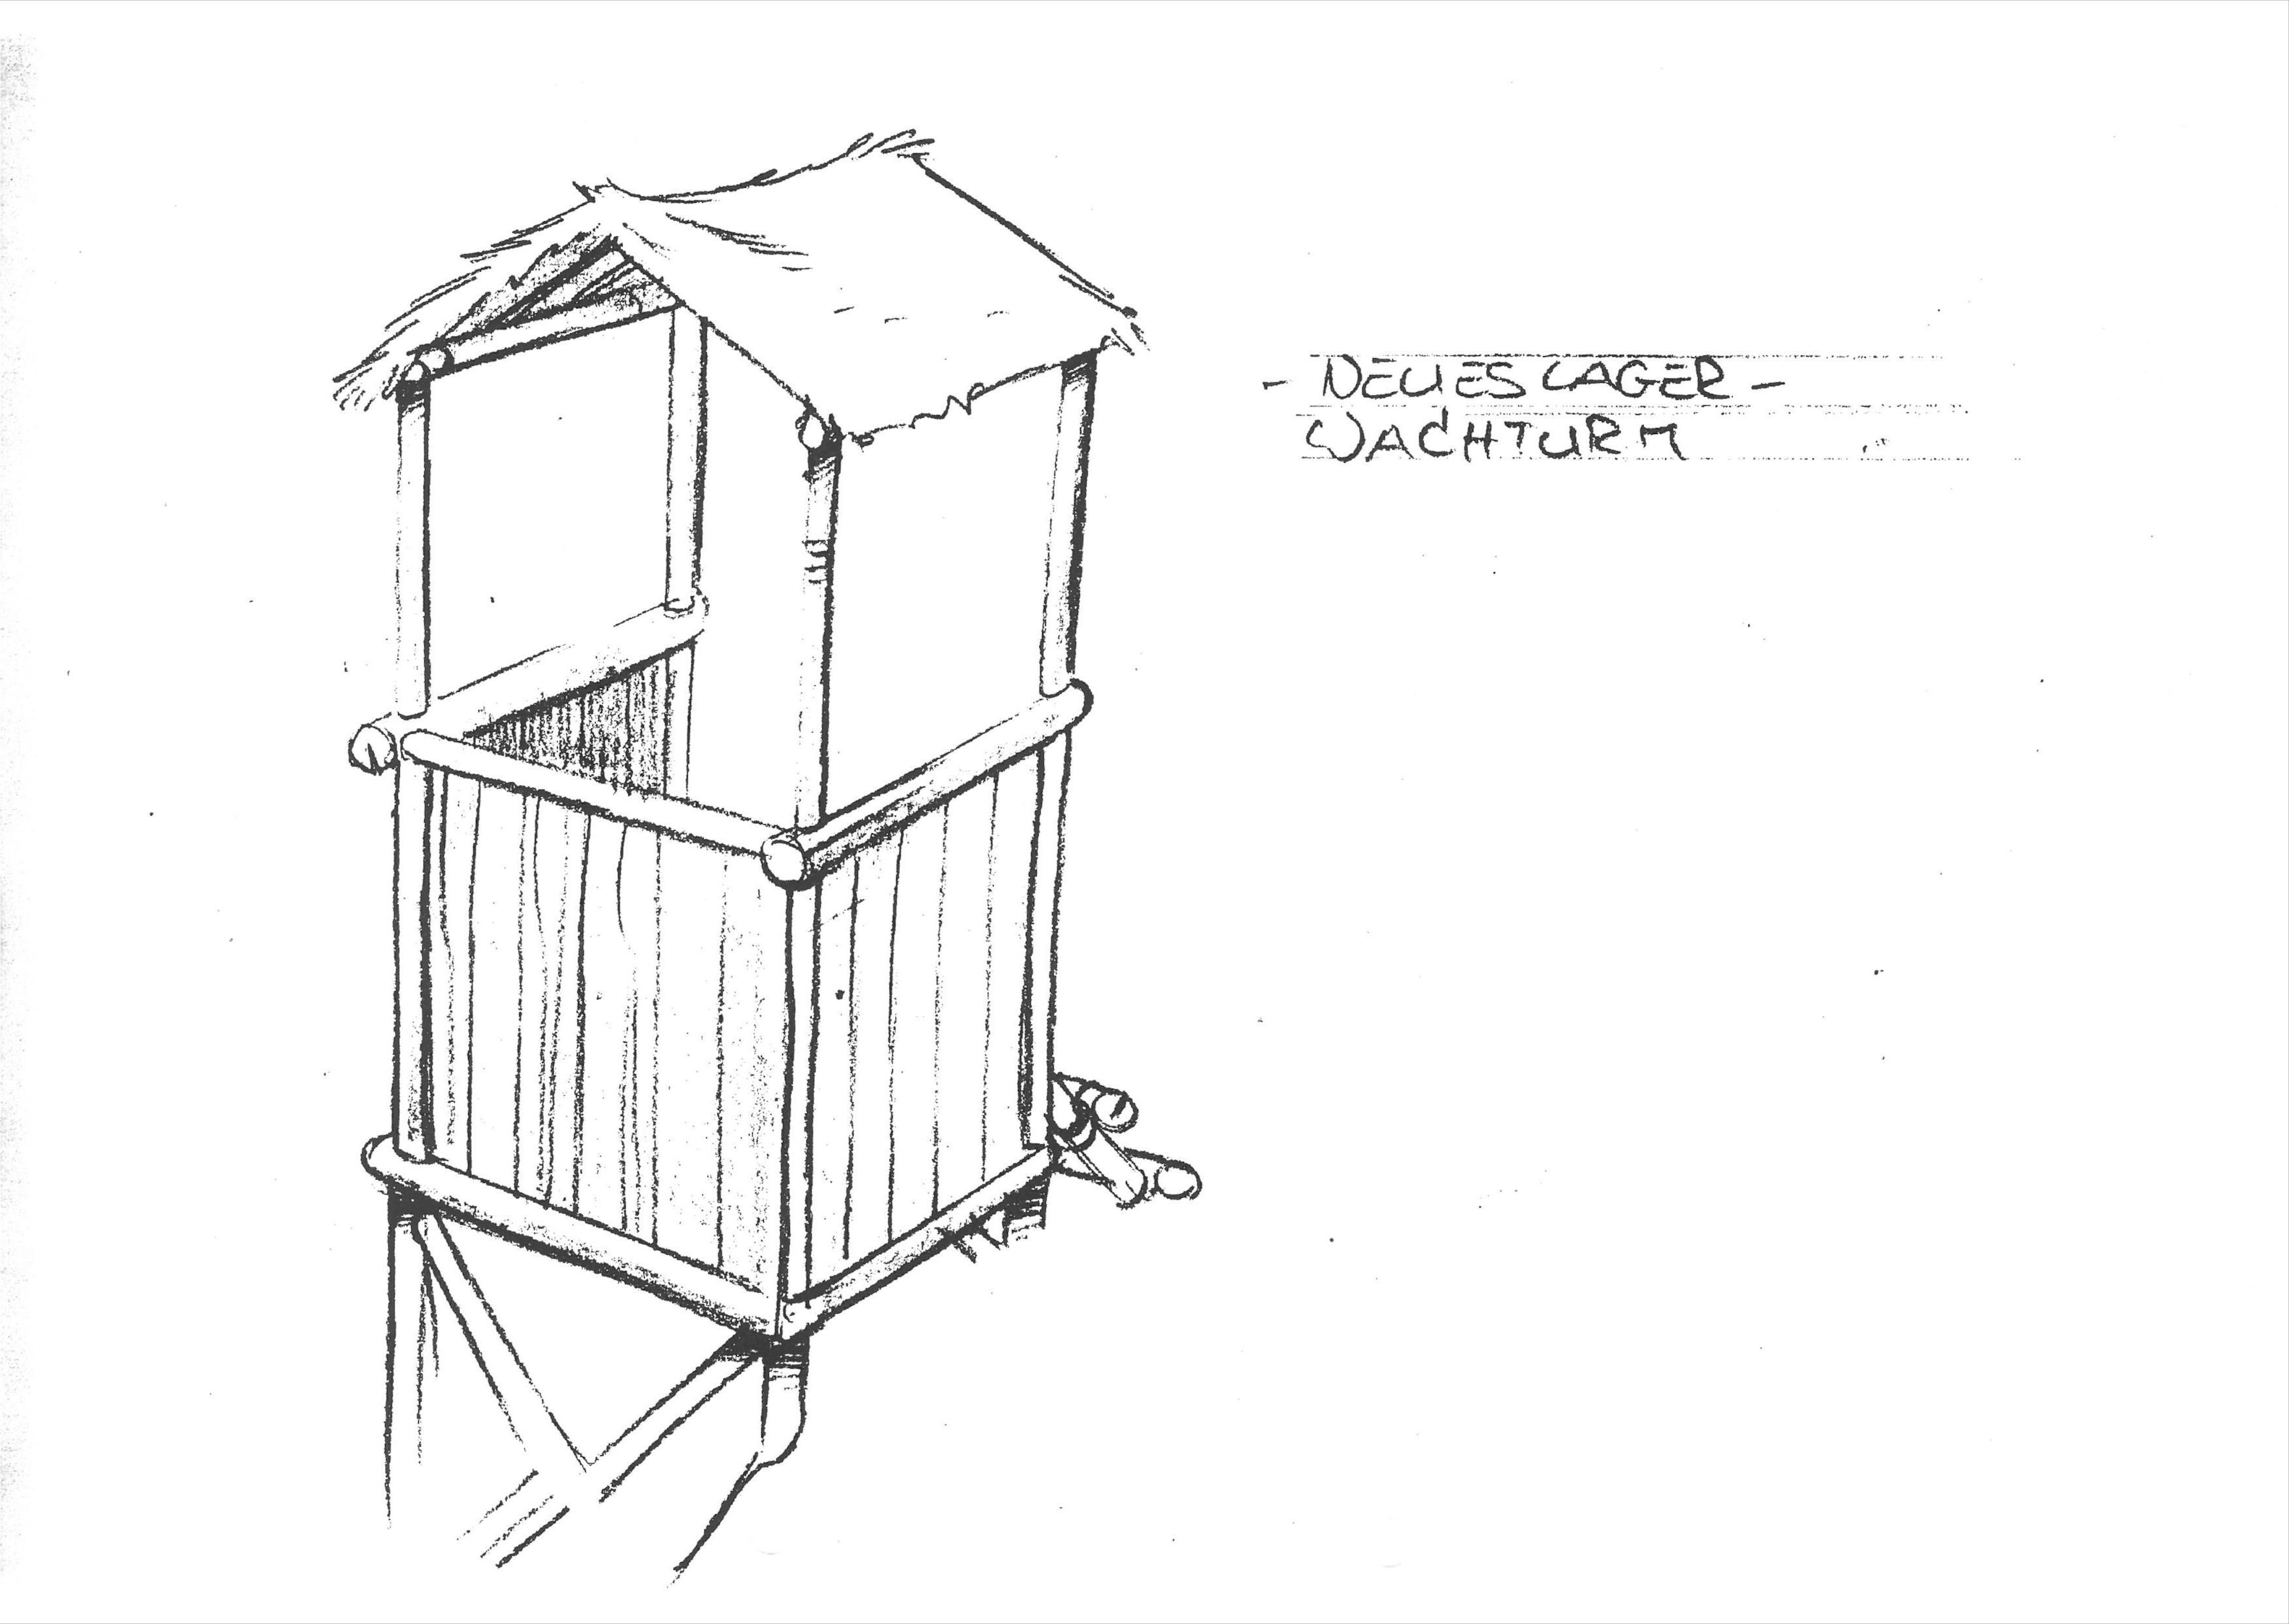 Neues Lager - Wachturm